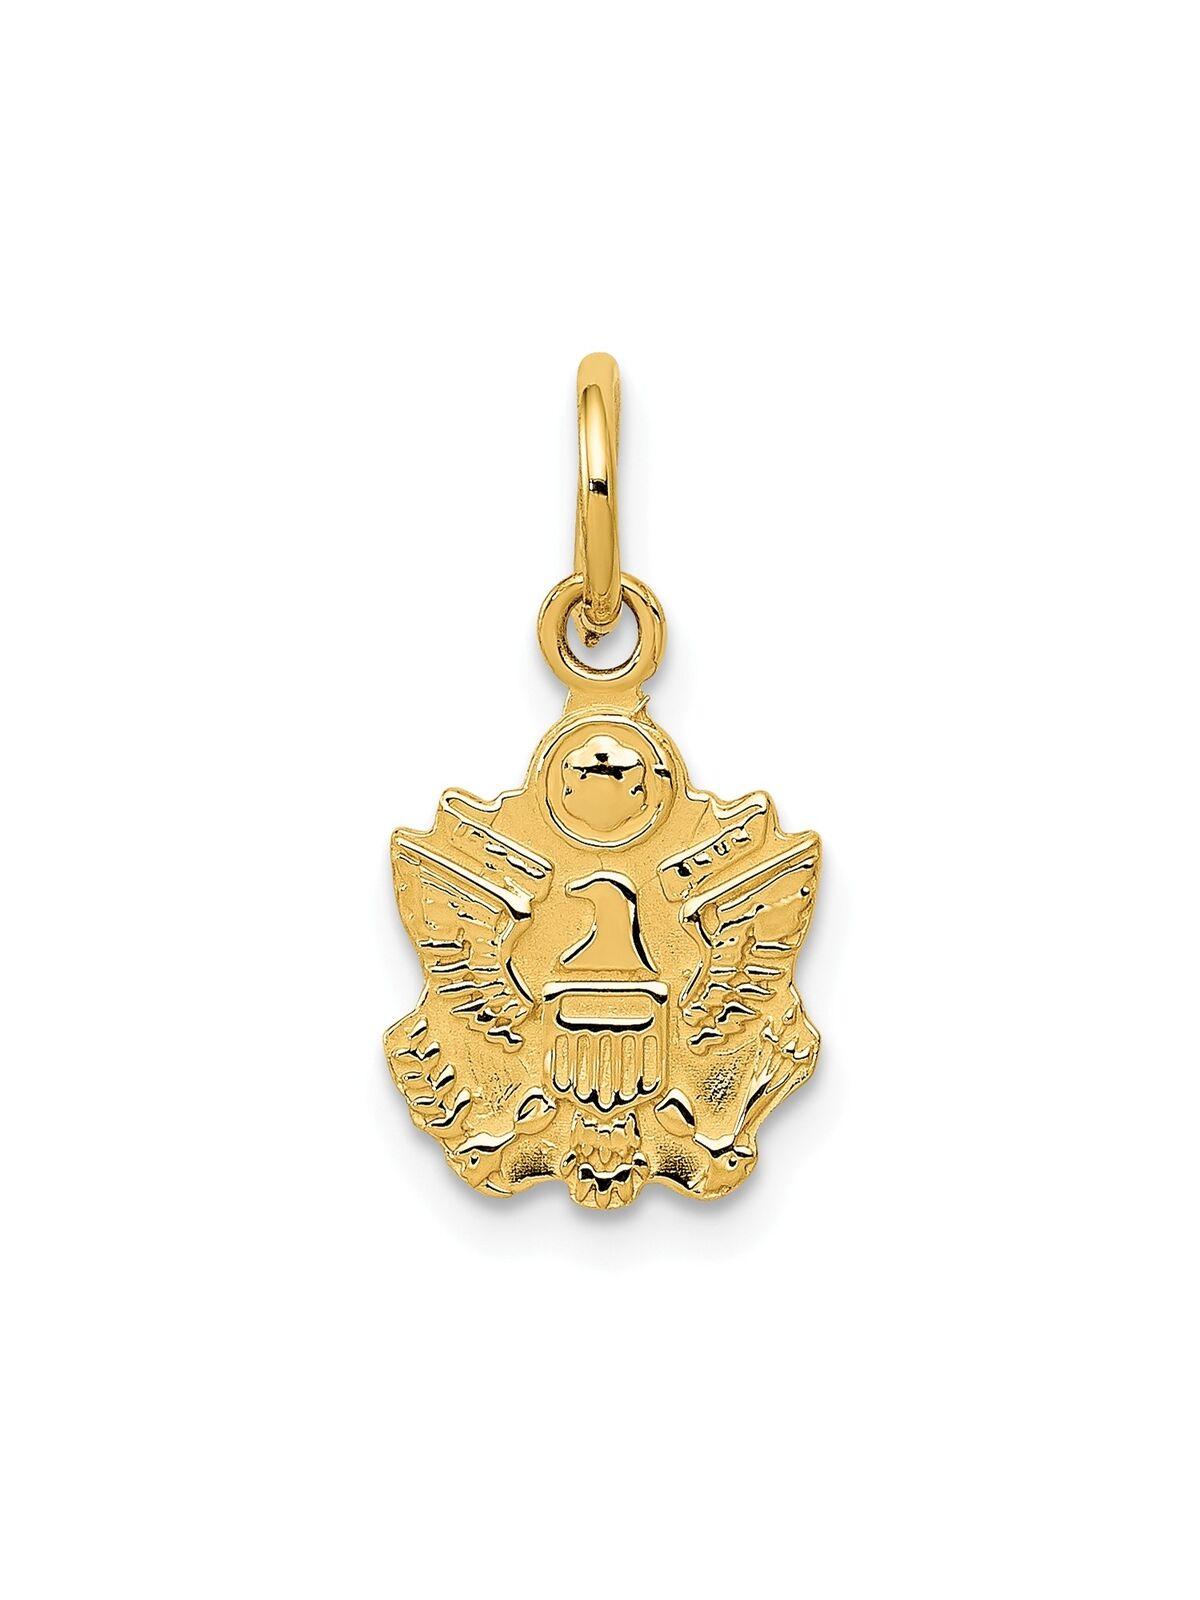 14k Yellow gold U.S. Army Insignia Charm Pendant - 9x16.5mm 0.73 Grams